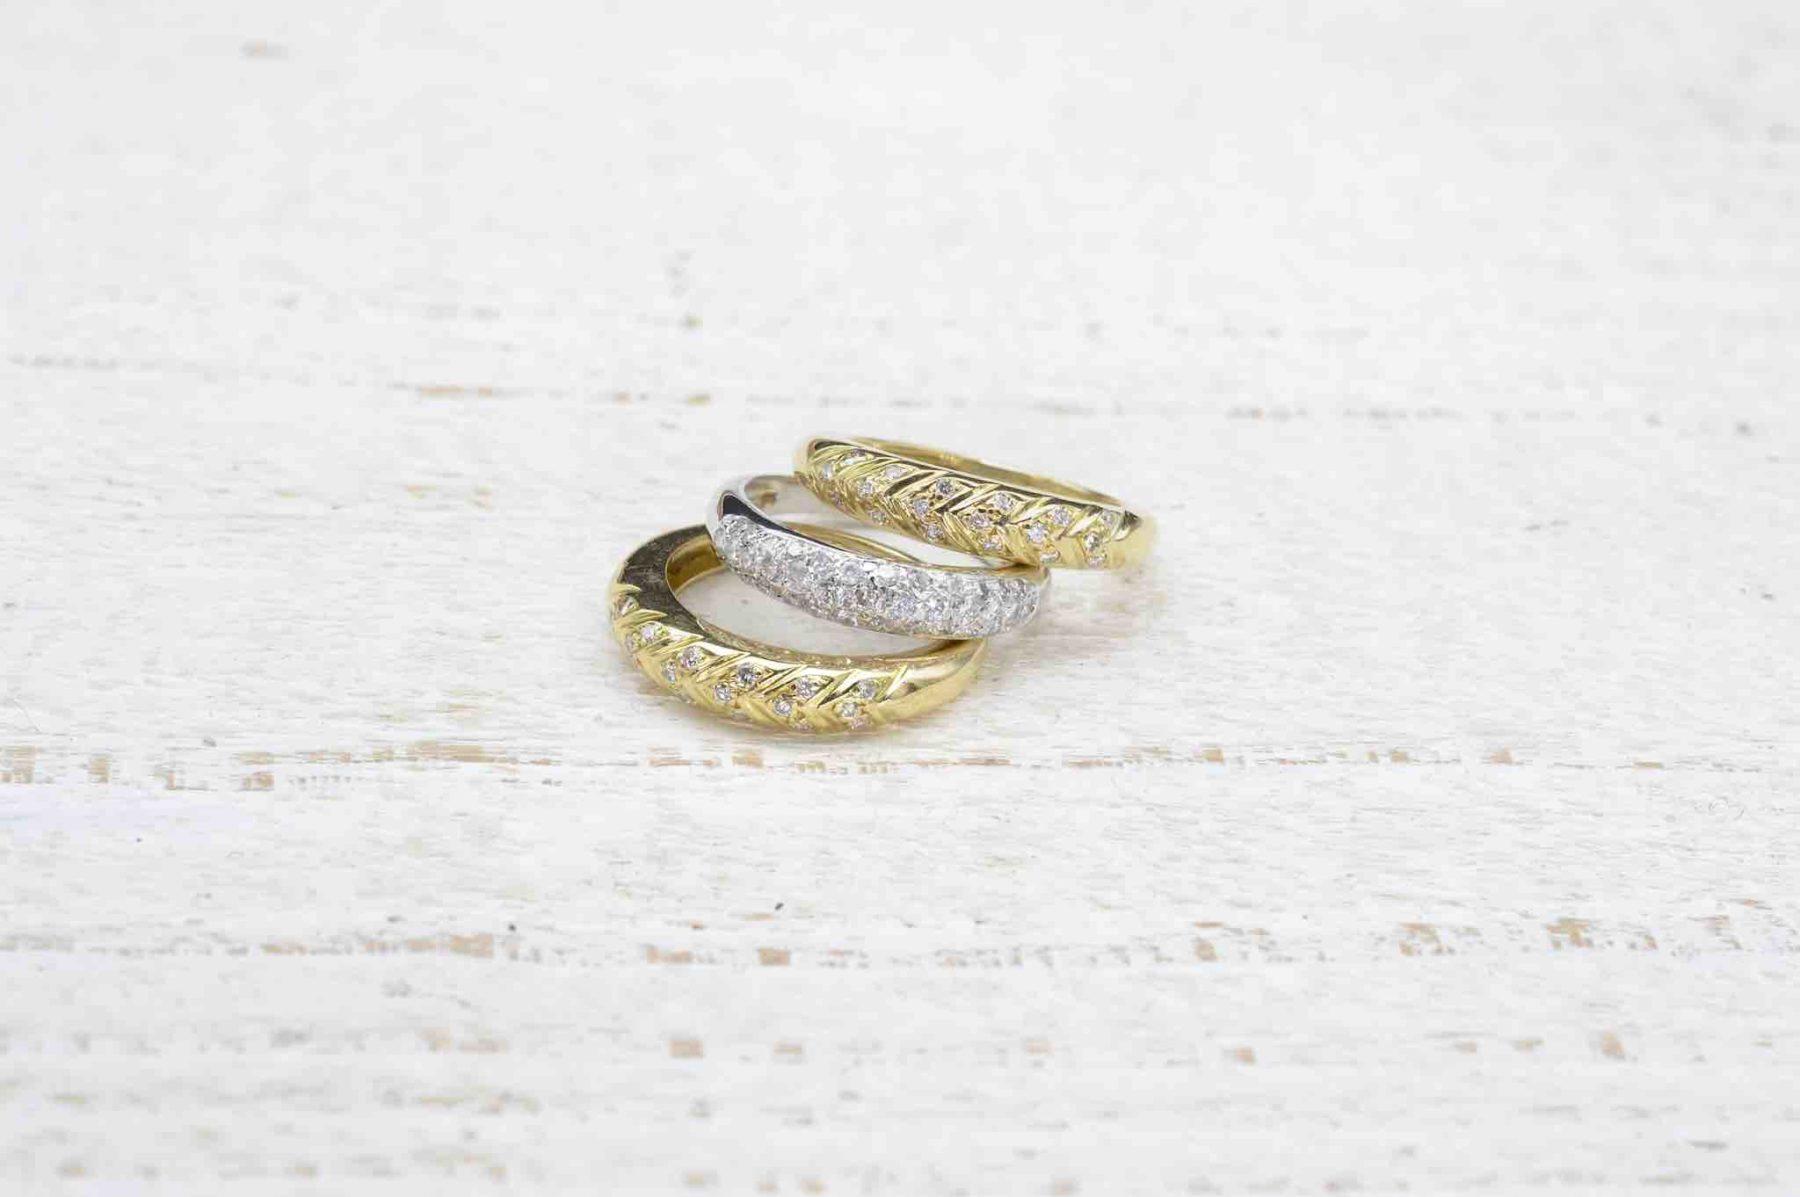 bagues trio diamants en or jaune et or blanc 18k